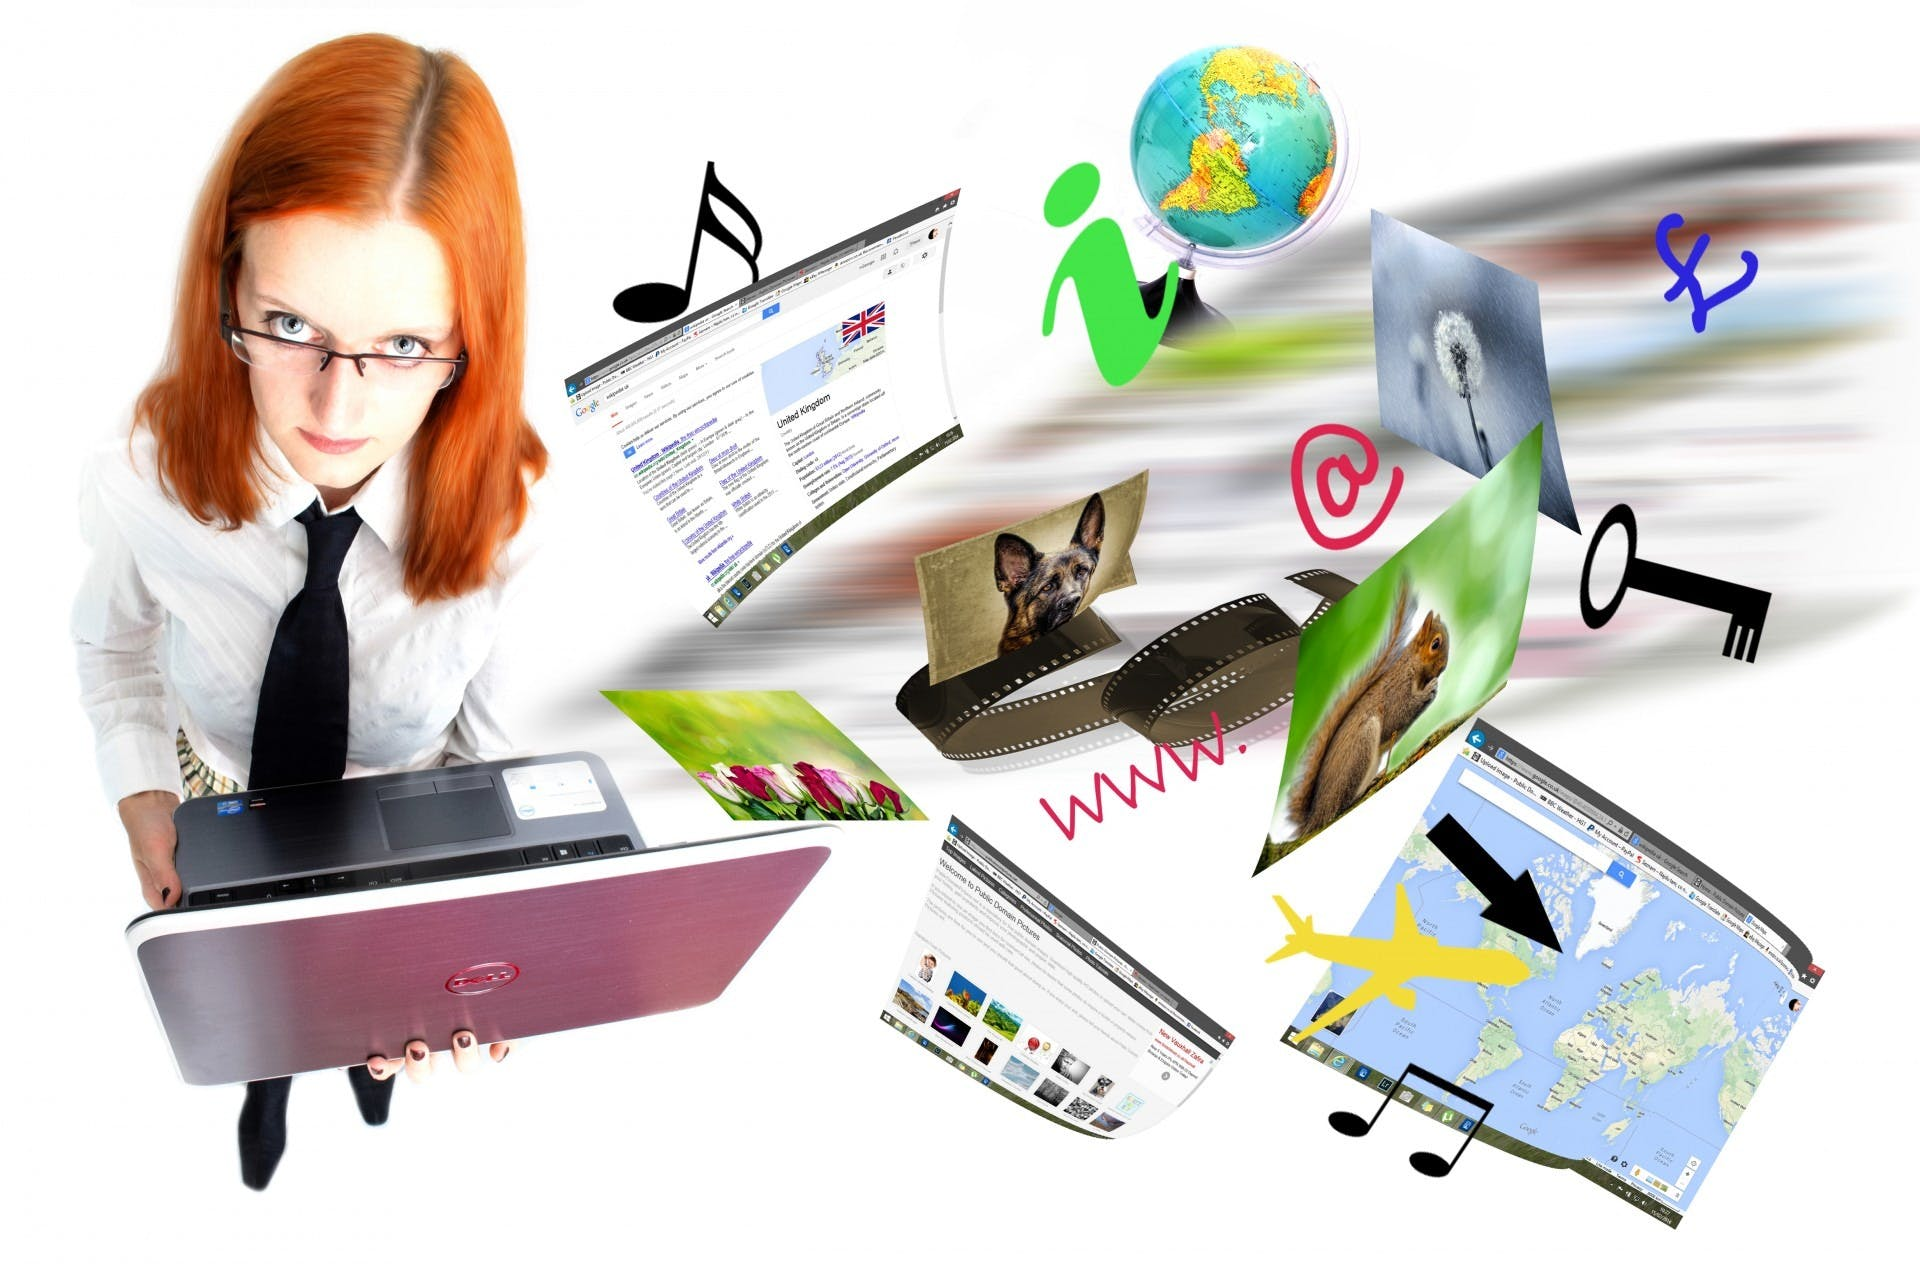 Free stock photo of people, building, laptop, browsing